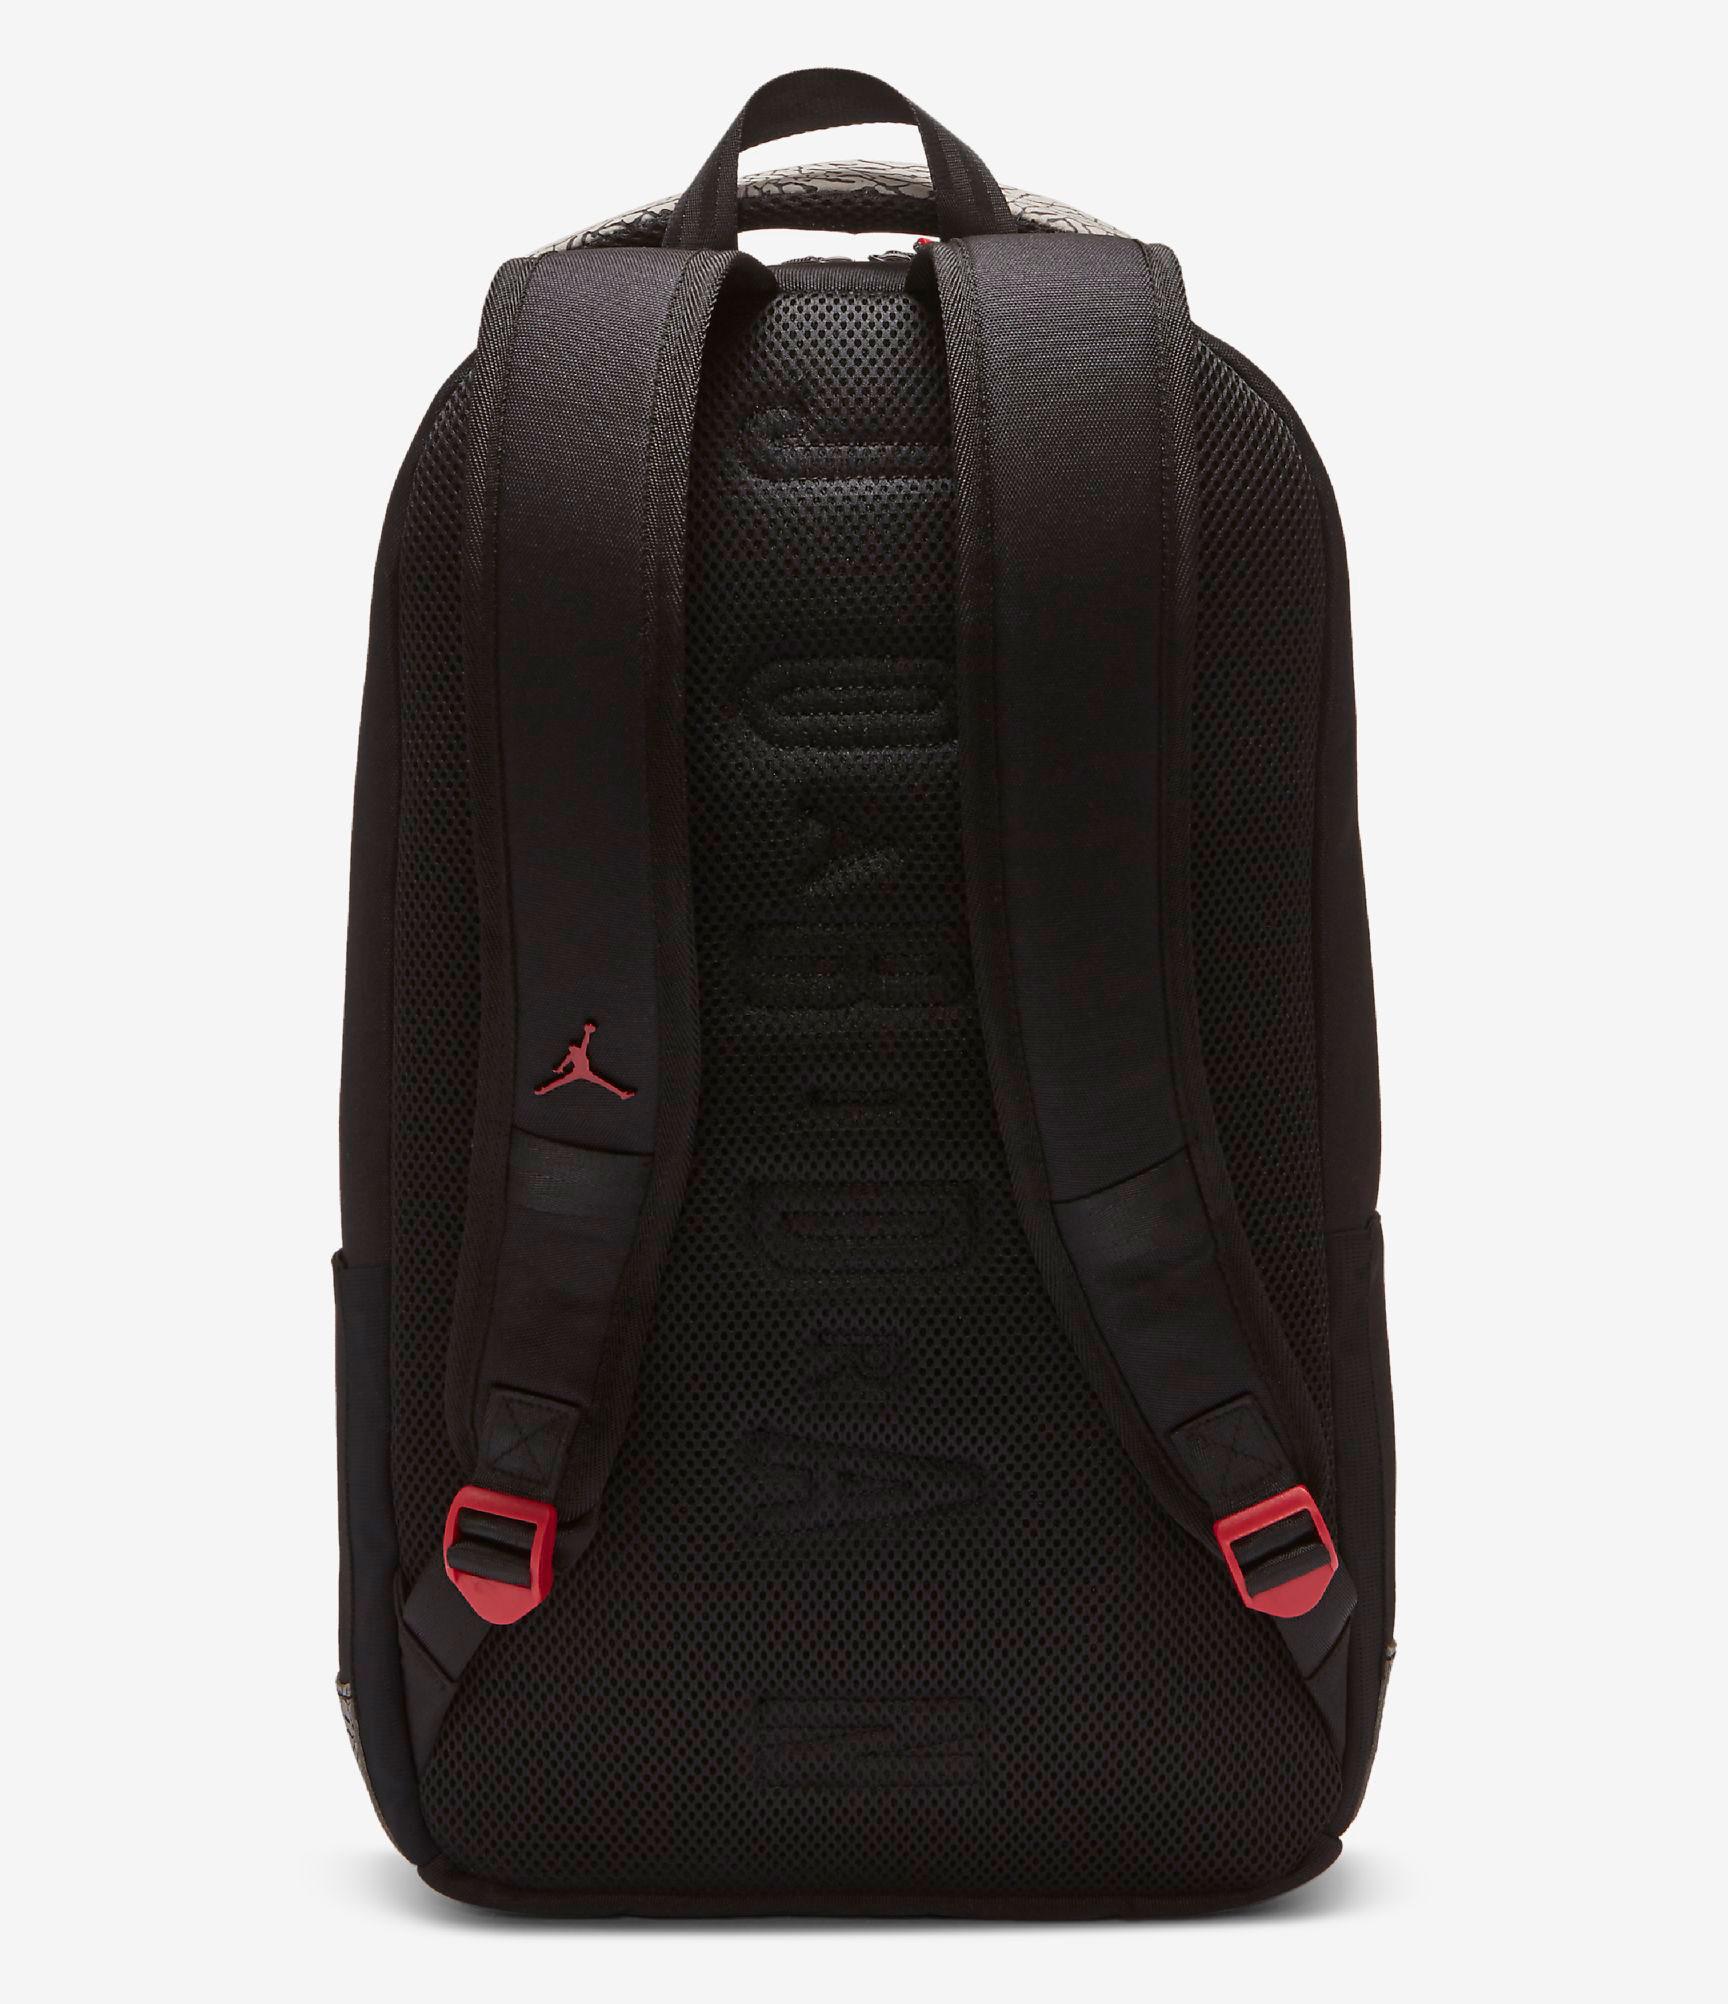 jordan-3-denim-fire-red-backpack-2